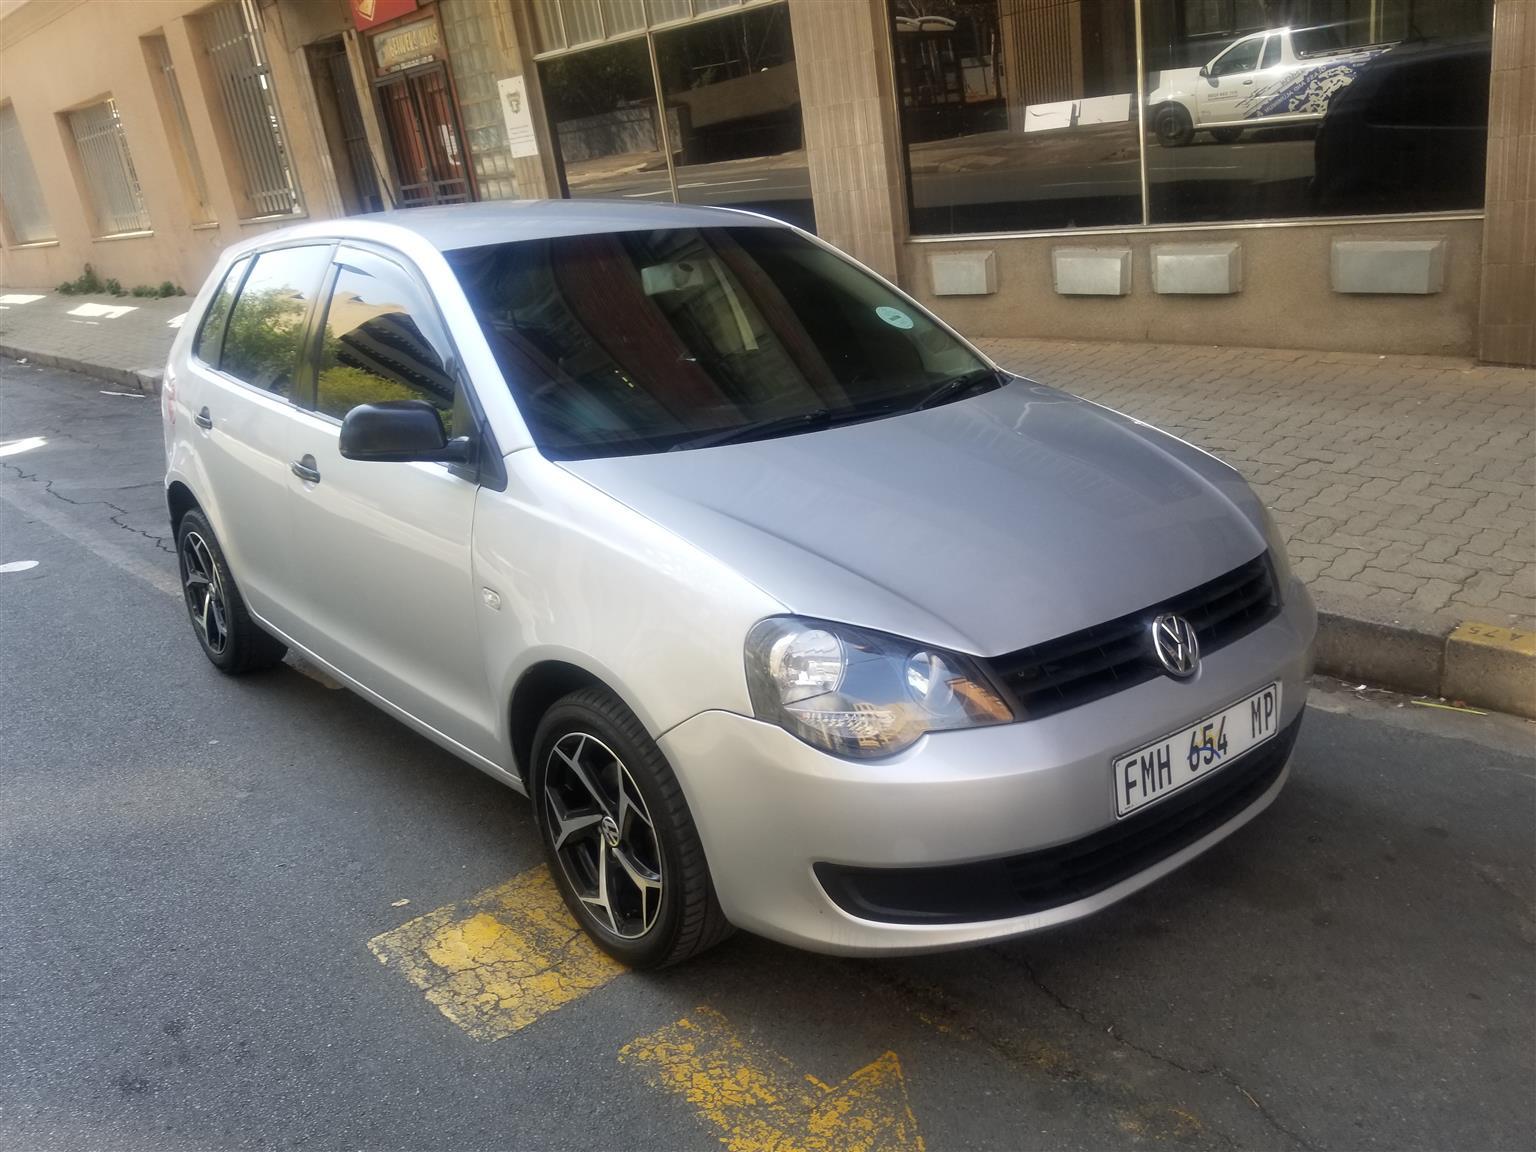 2012 VW Polo Vivo hatch 5-door POLO VIVO 1.4 COMFORTLINE (5DR)